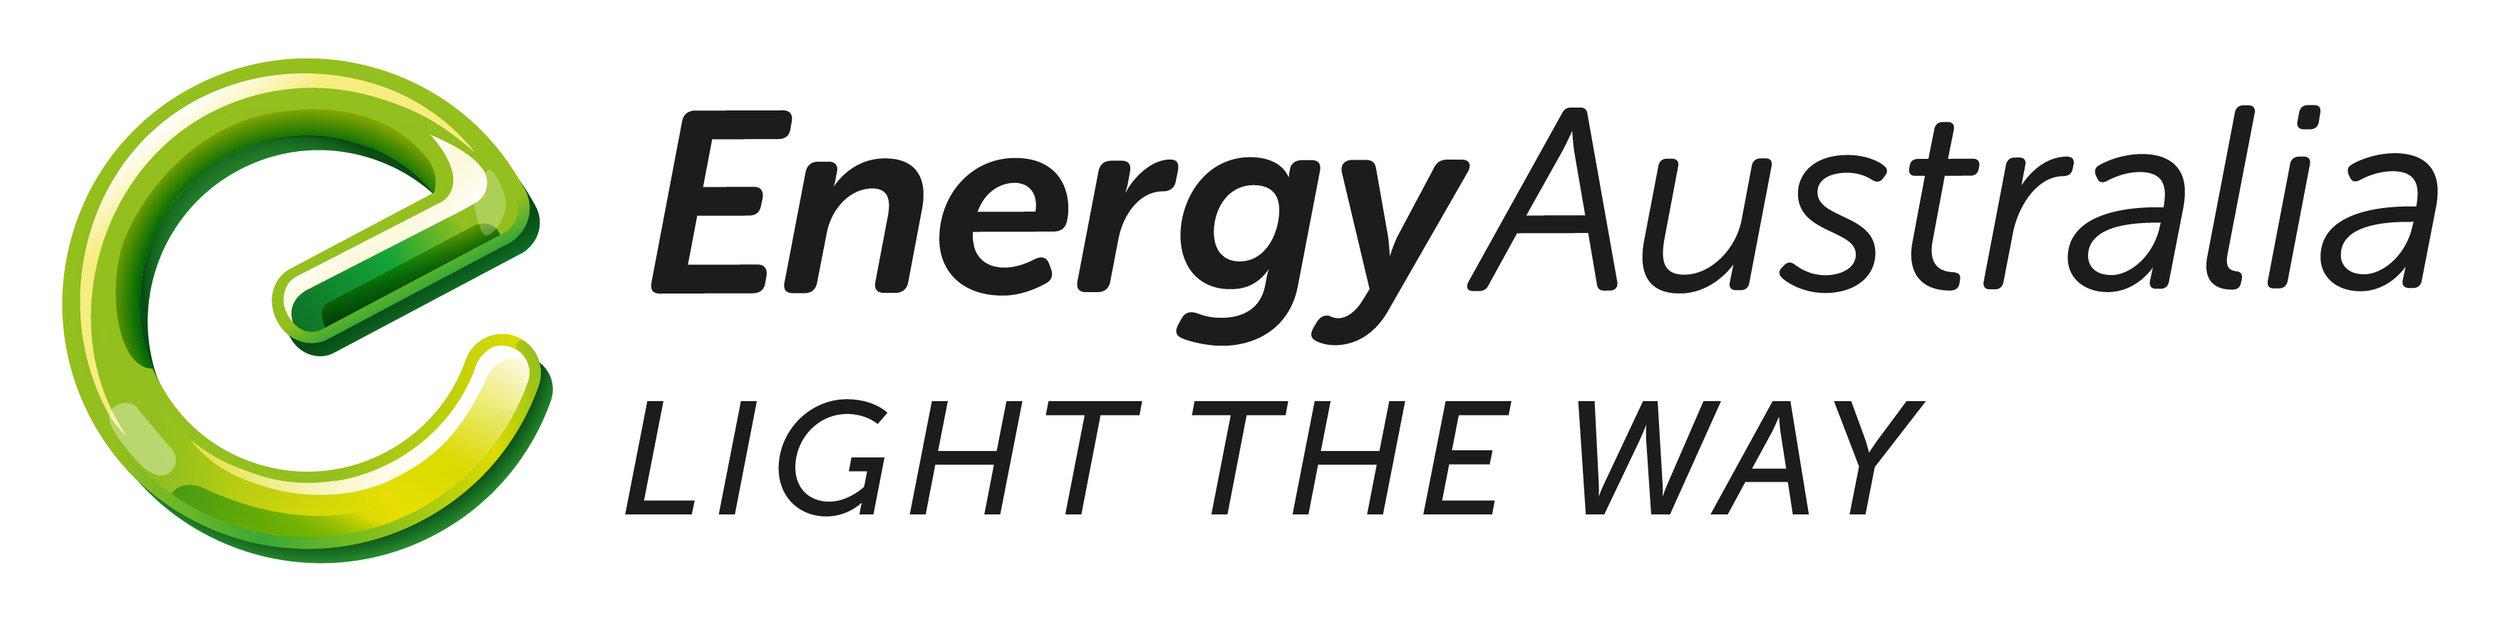 EnergyAustralia-Paddl-Co-final-instalment-COSBOA-Innovation-Games-Light-the-way.jpg